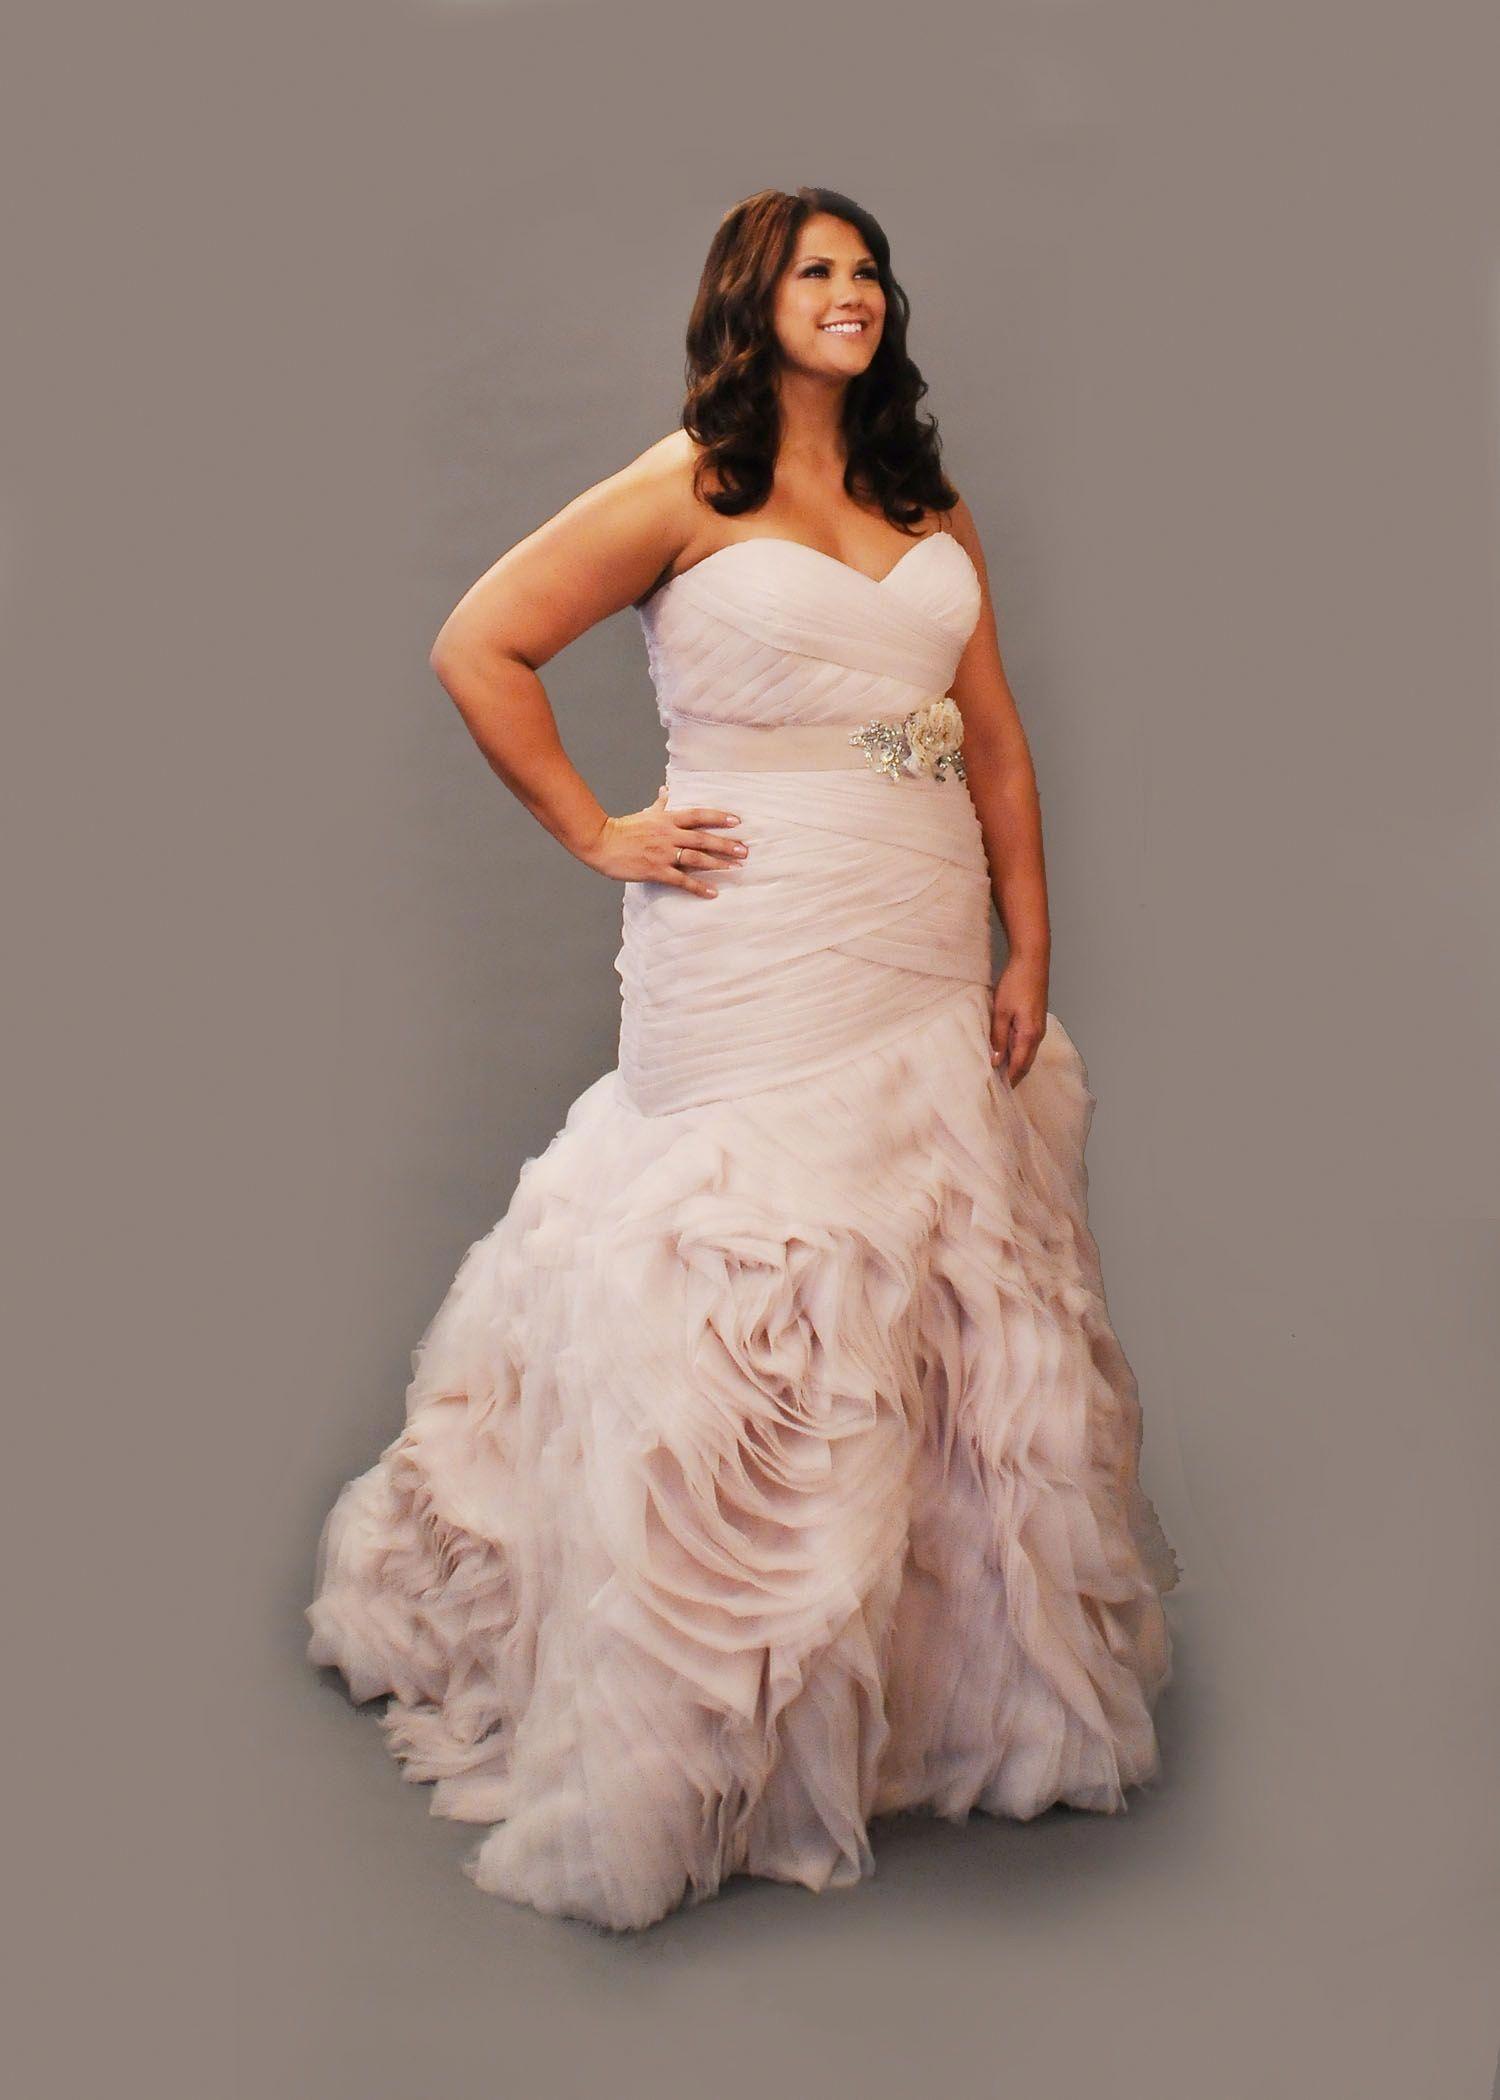 Plus Sized Wedding Dresses Full Figured Fun Plussizedweddingdressescheap In 2020 Wedding Dresses Blush Plus Size Wedding Gowns Wedding Dresses Plus Size